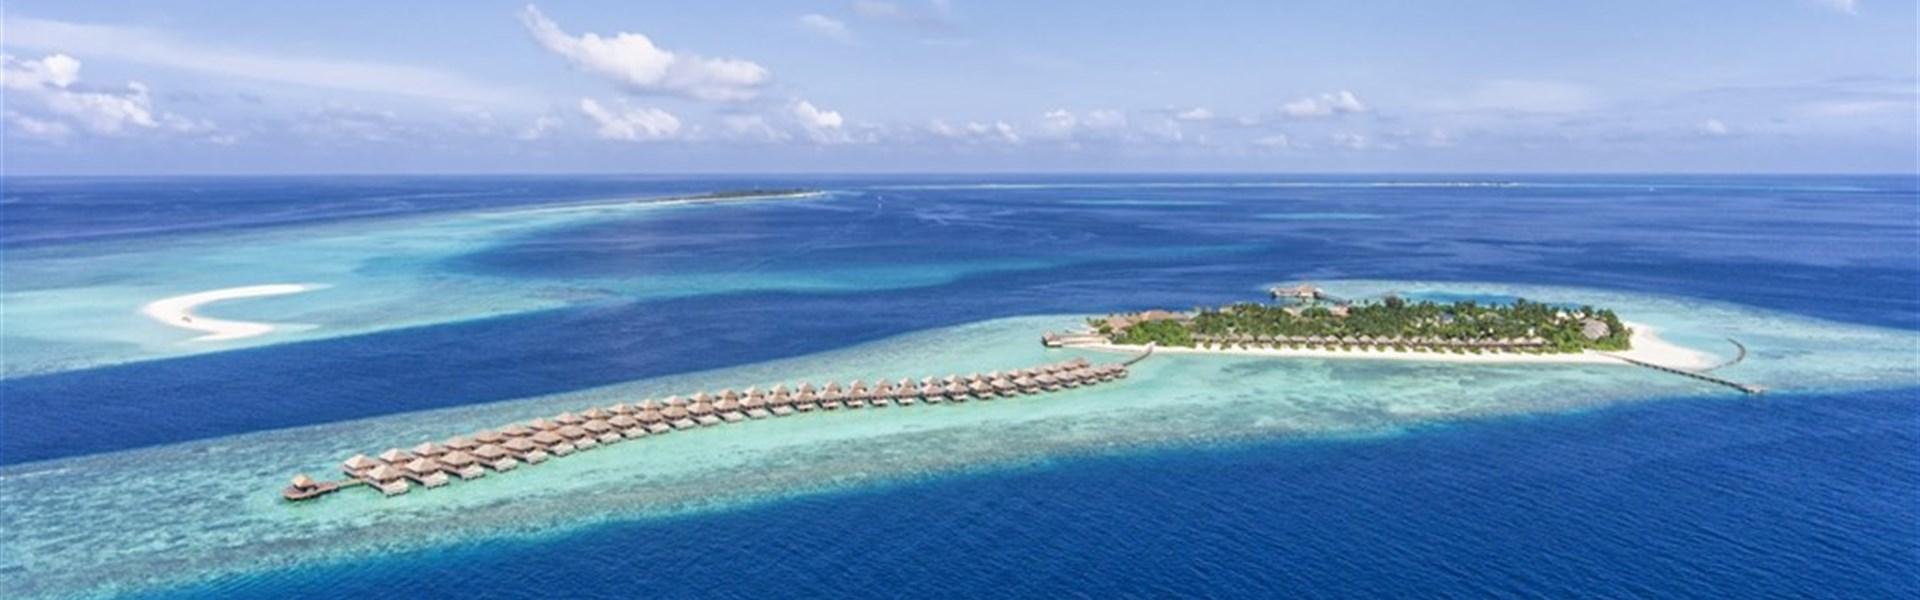 Marco Polo - Hurawalhi Island Resort Maledives -